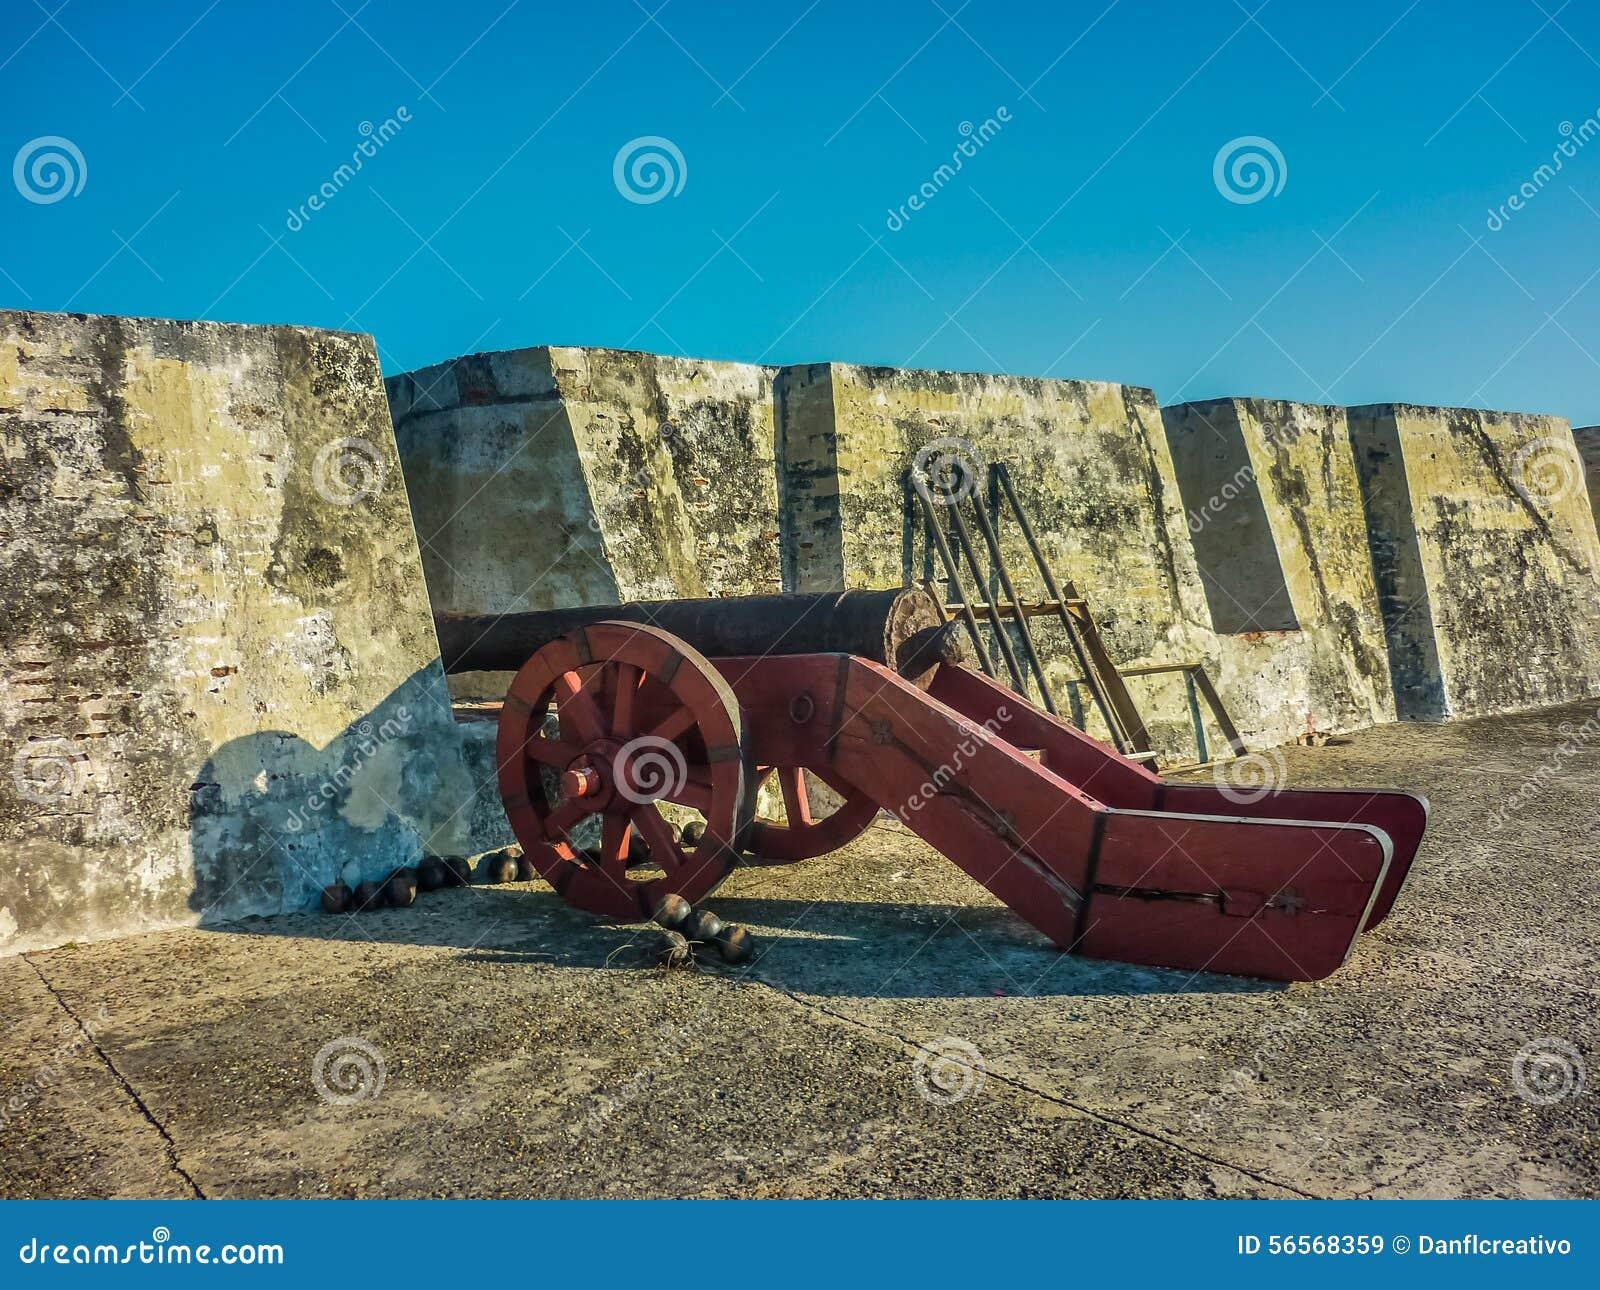 Download Αποικιακό πολεμικό αρχαίο πυροβόλο στο φρούριο της Καρχηδόνας Στοκ Εικόνα - εικόνα από οχύρωση, felipe: 56568359